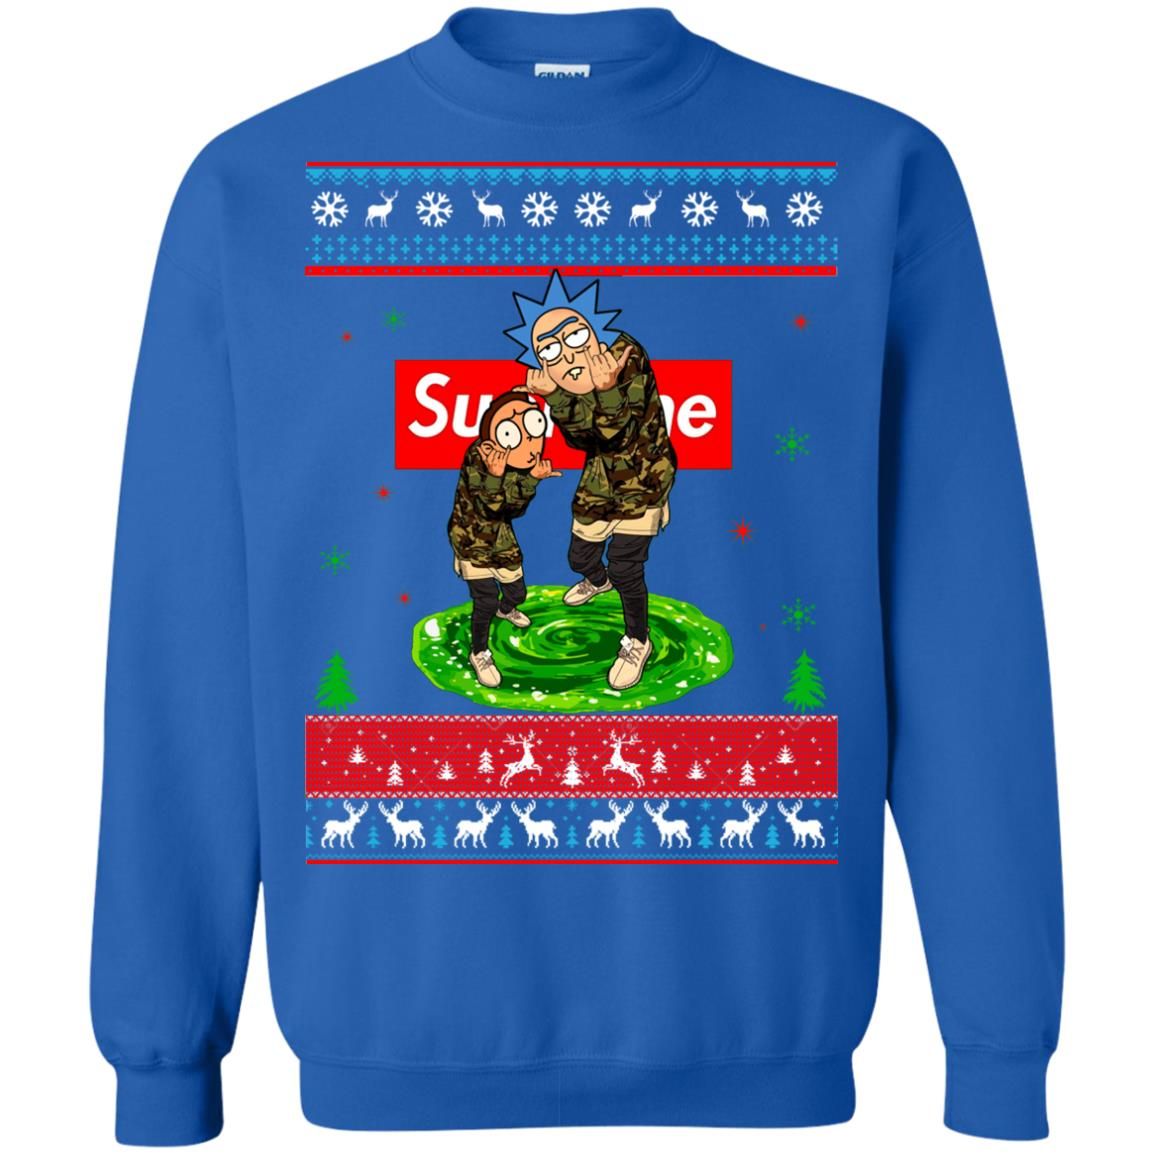 Rick and Morty Supreme Ugly Christmas Sweater, Hoodie - Rockatee